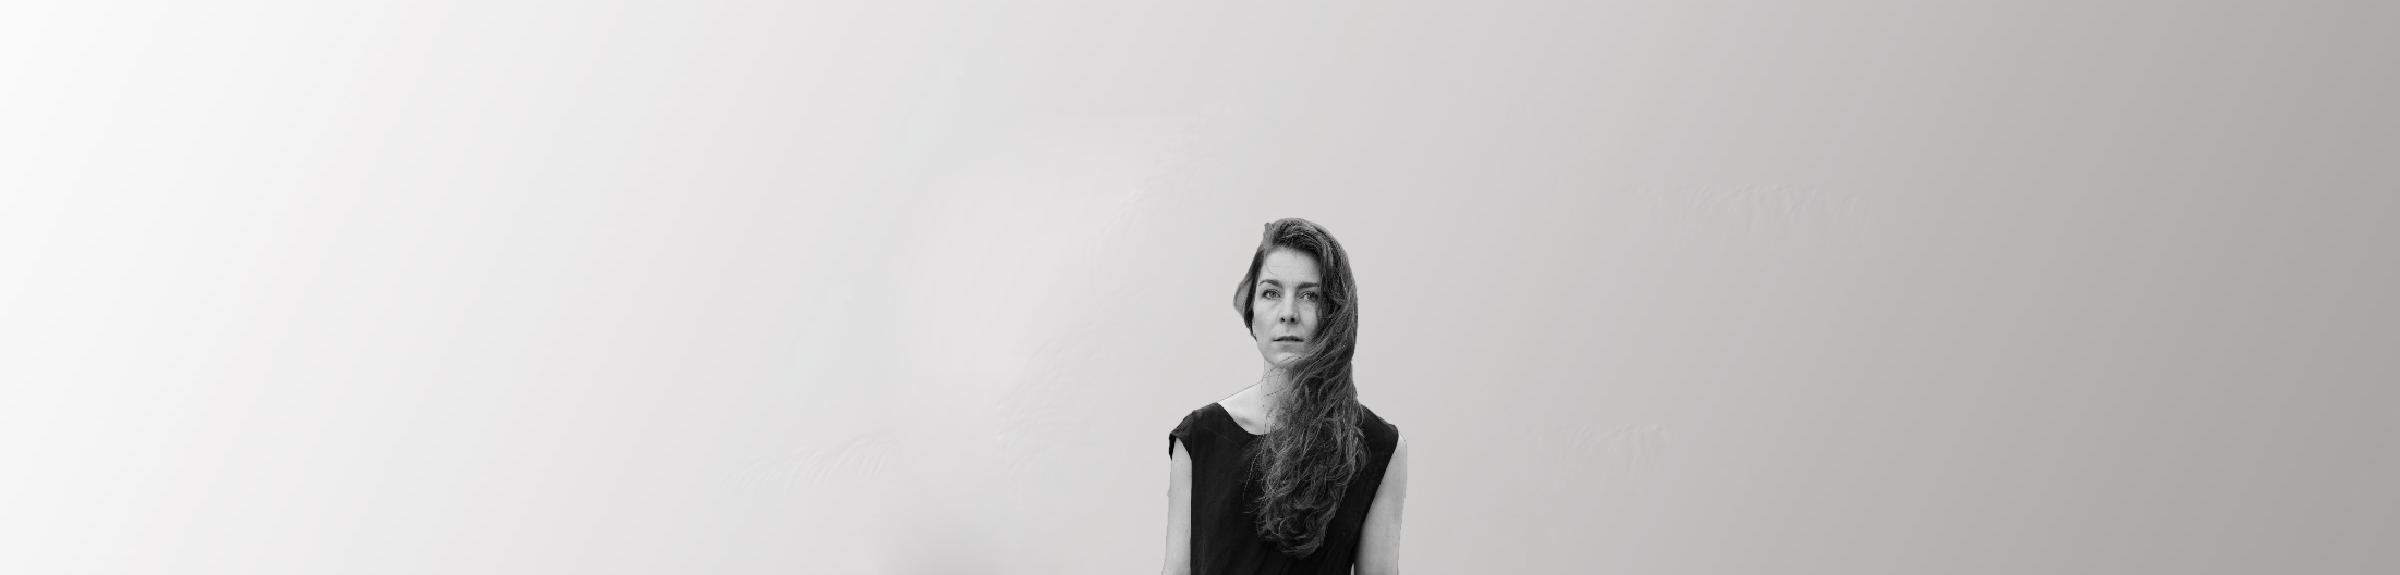 Fabienne Ambuehl